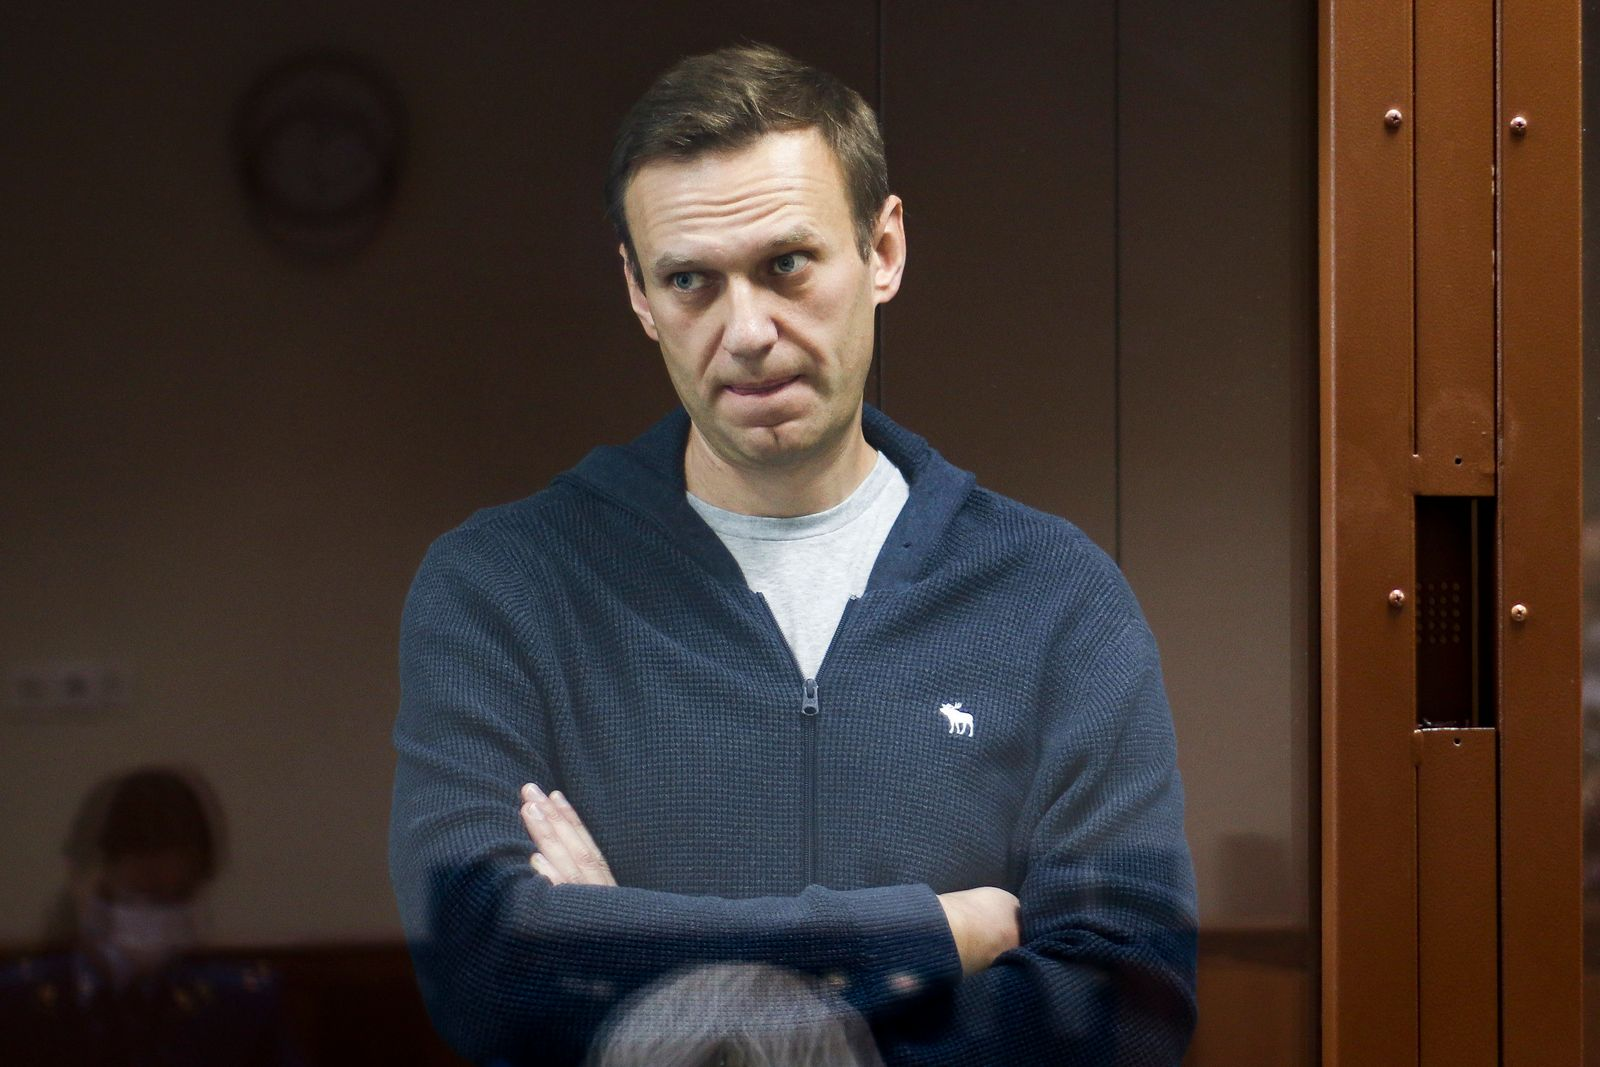 Fortsetzung Verhandlung gegen Kremlkritiker Nawalny